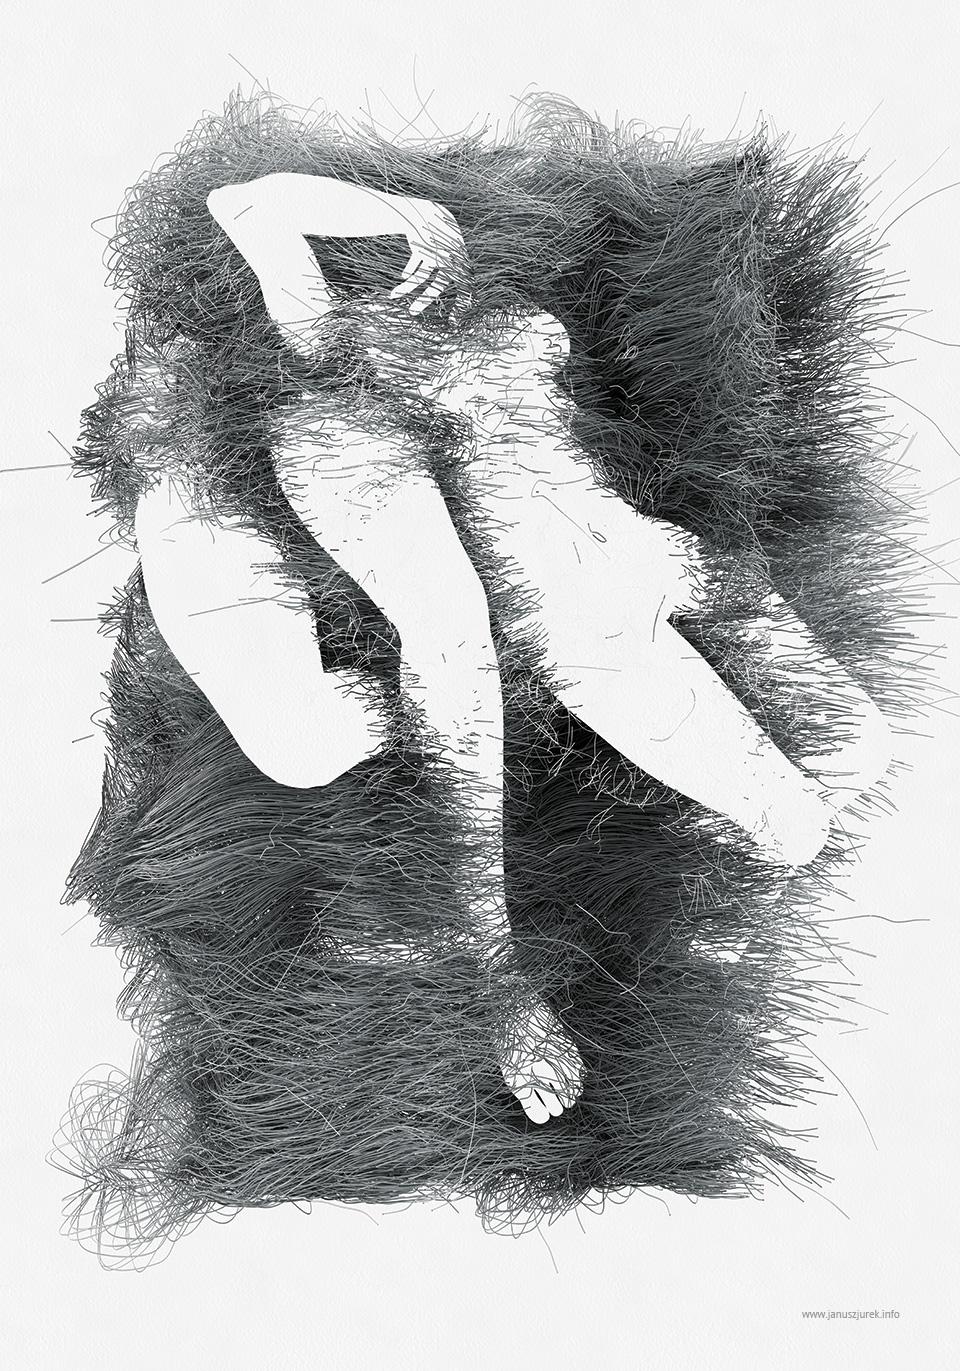 Nogi, nogi © Janusz Jurek